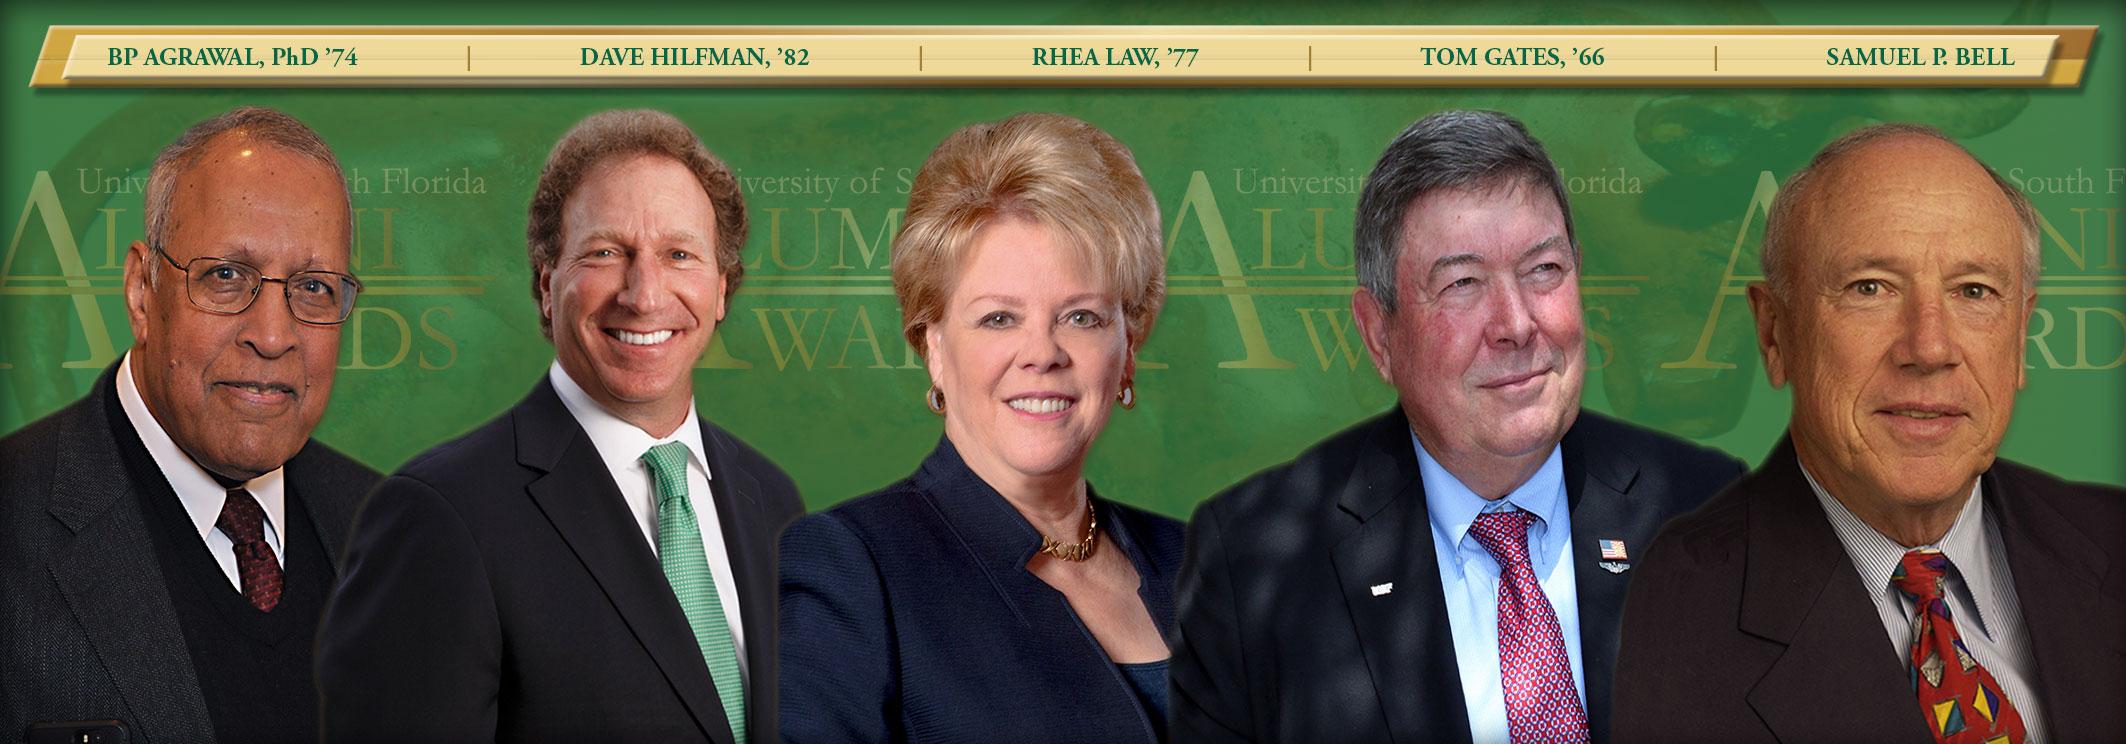 Usf alumni home page congratulations to our 2018 usf alumni award recipients maxwellsz